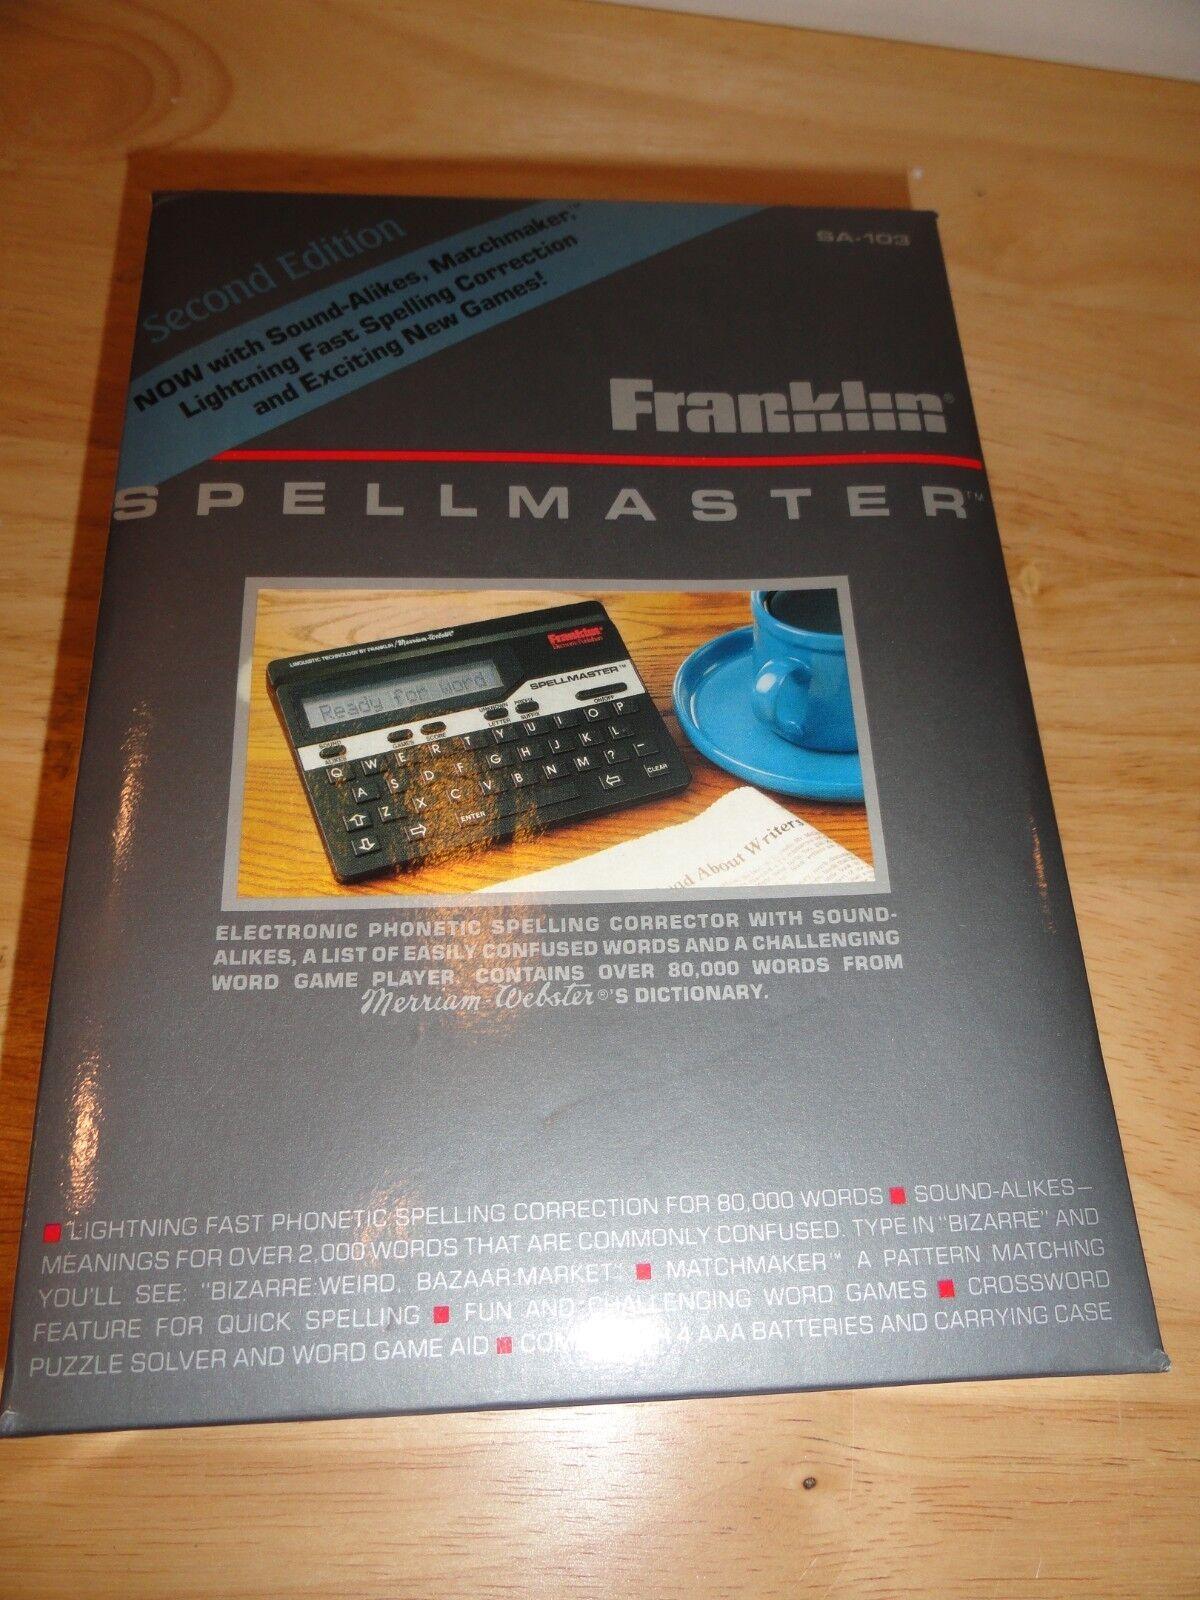 sa-103 Franklin spelling ace New